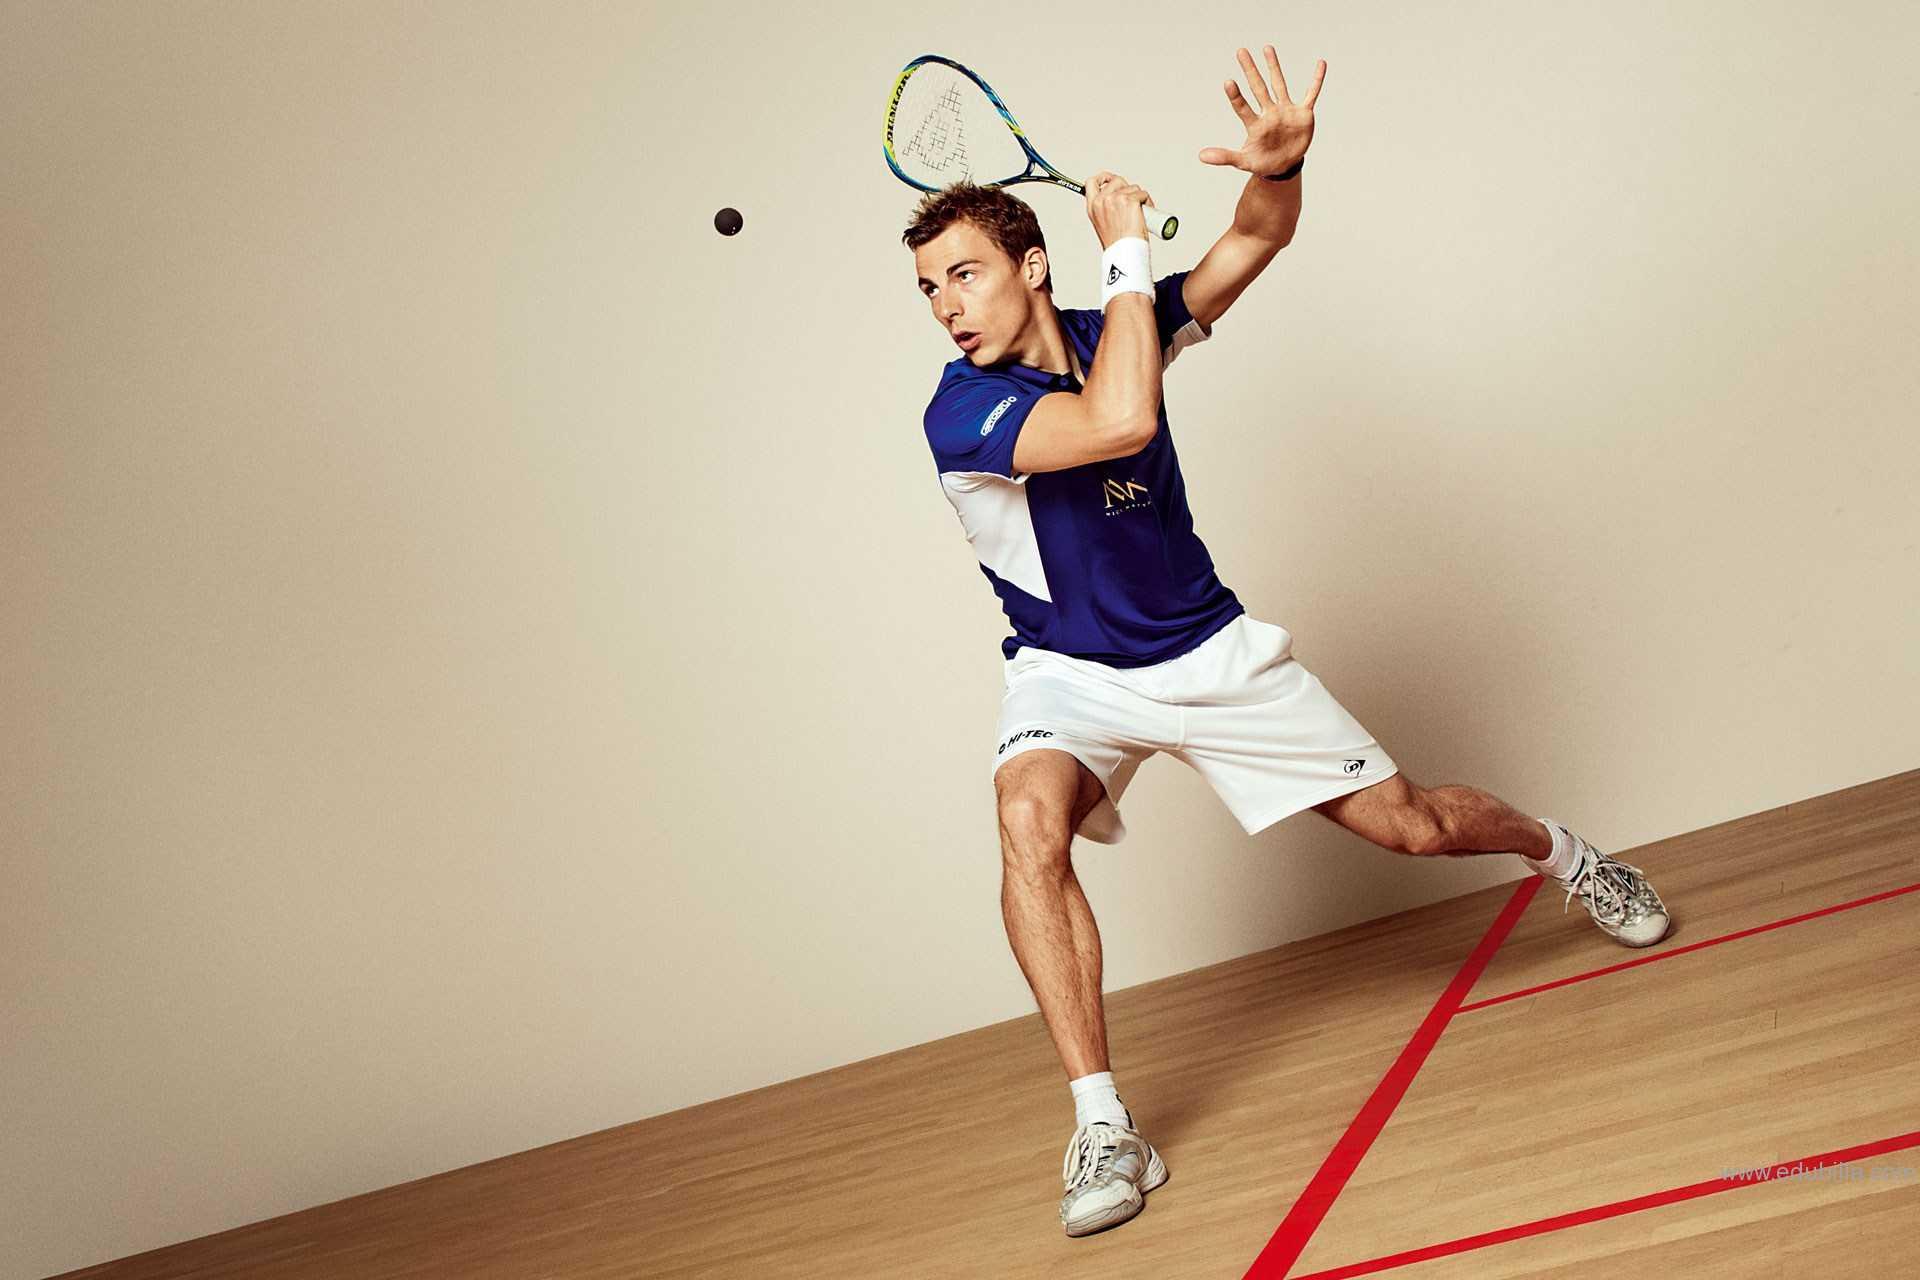 squashsport2.jpg